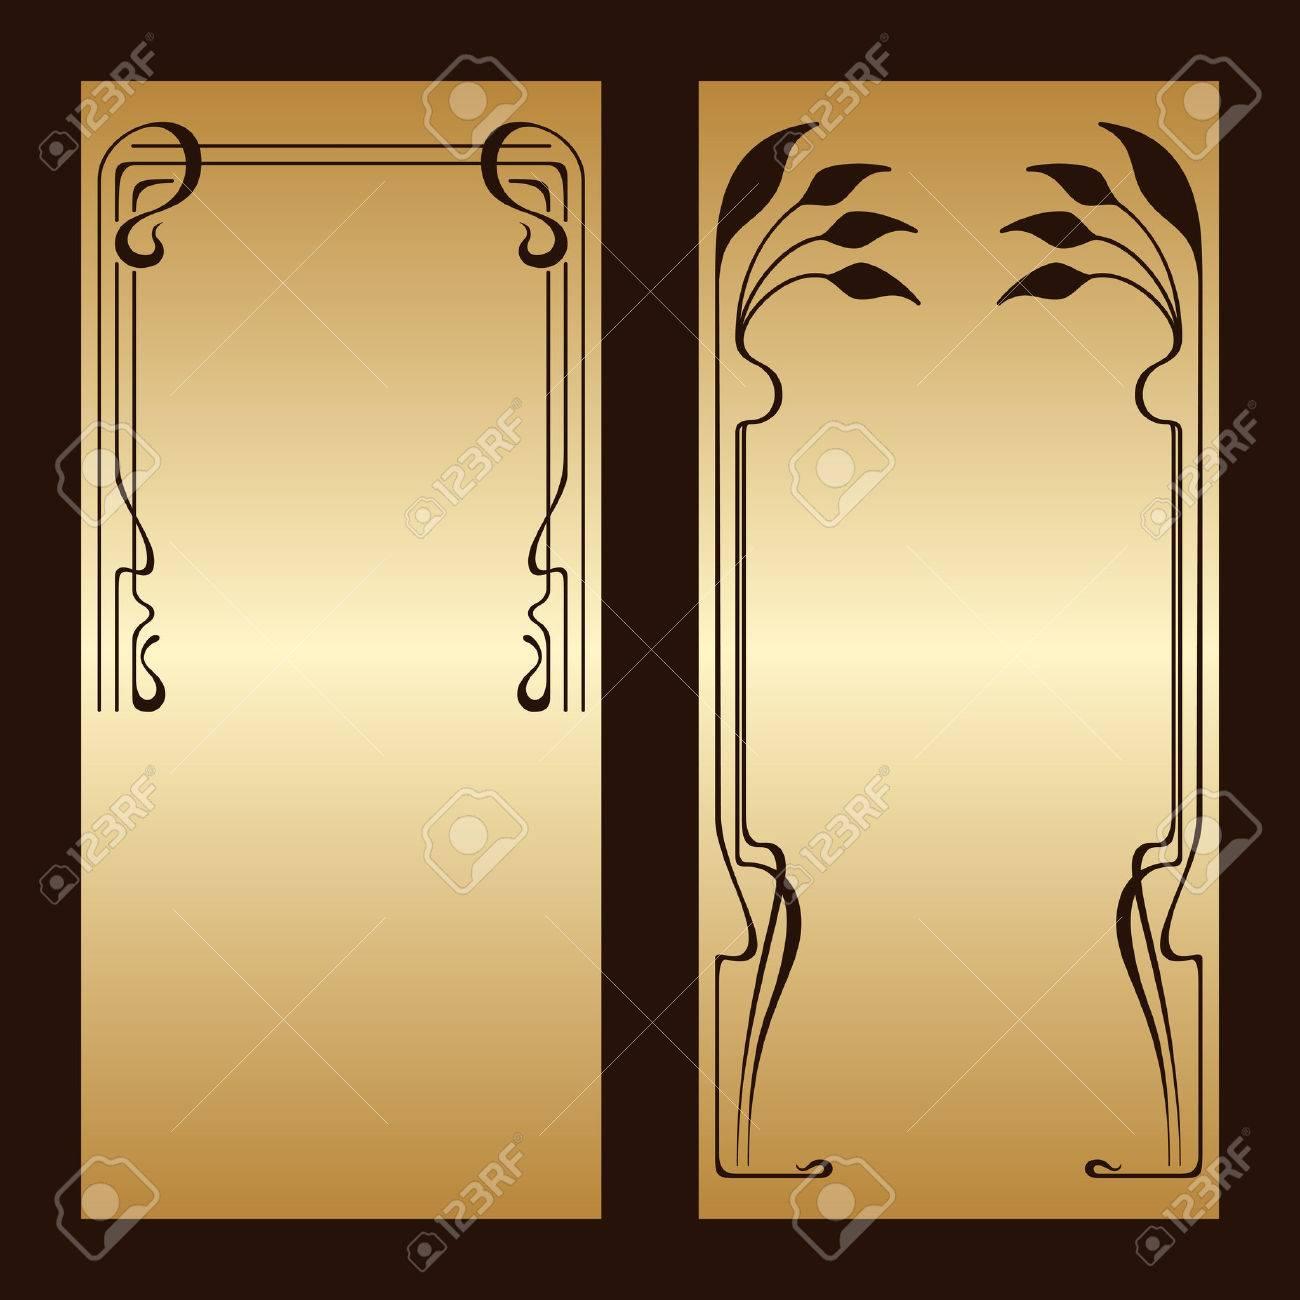 Vector art nouveau gold invitation cards with space for text banco de imagens vector art nouveau gold invitation cards with space for text stopboris Images